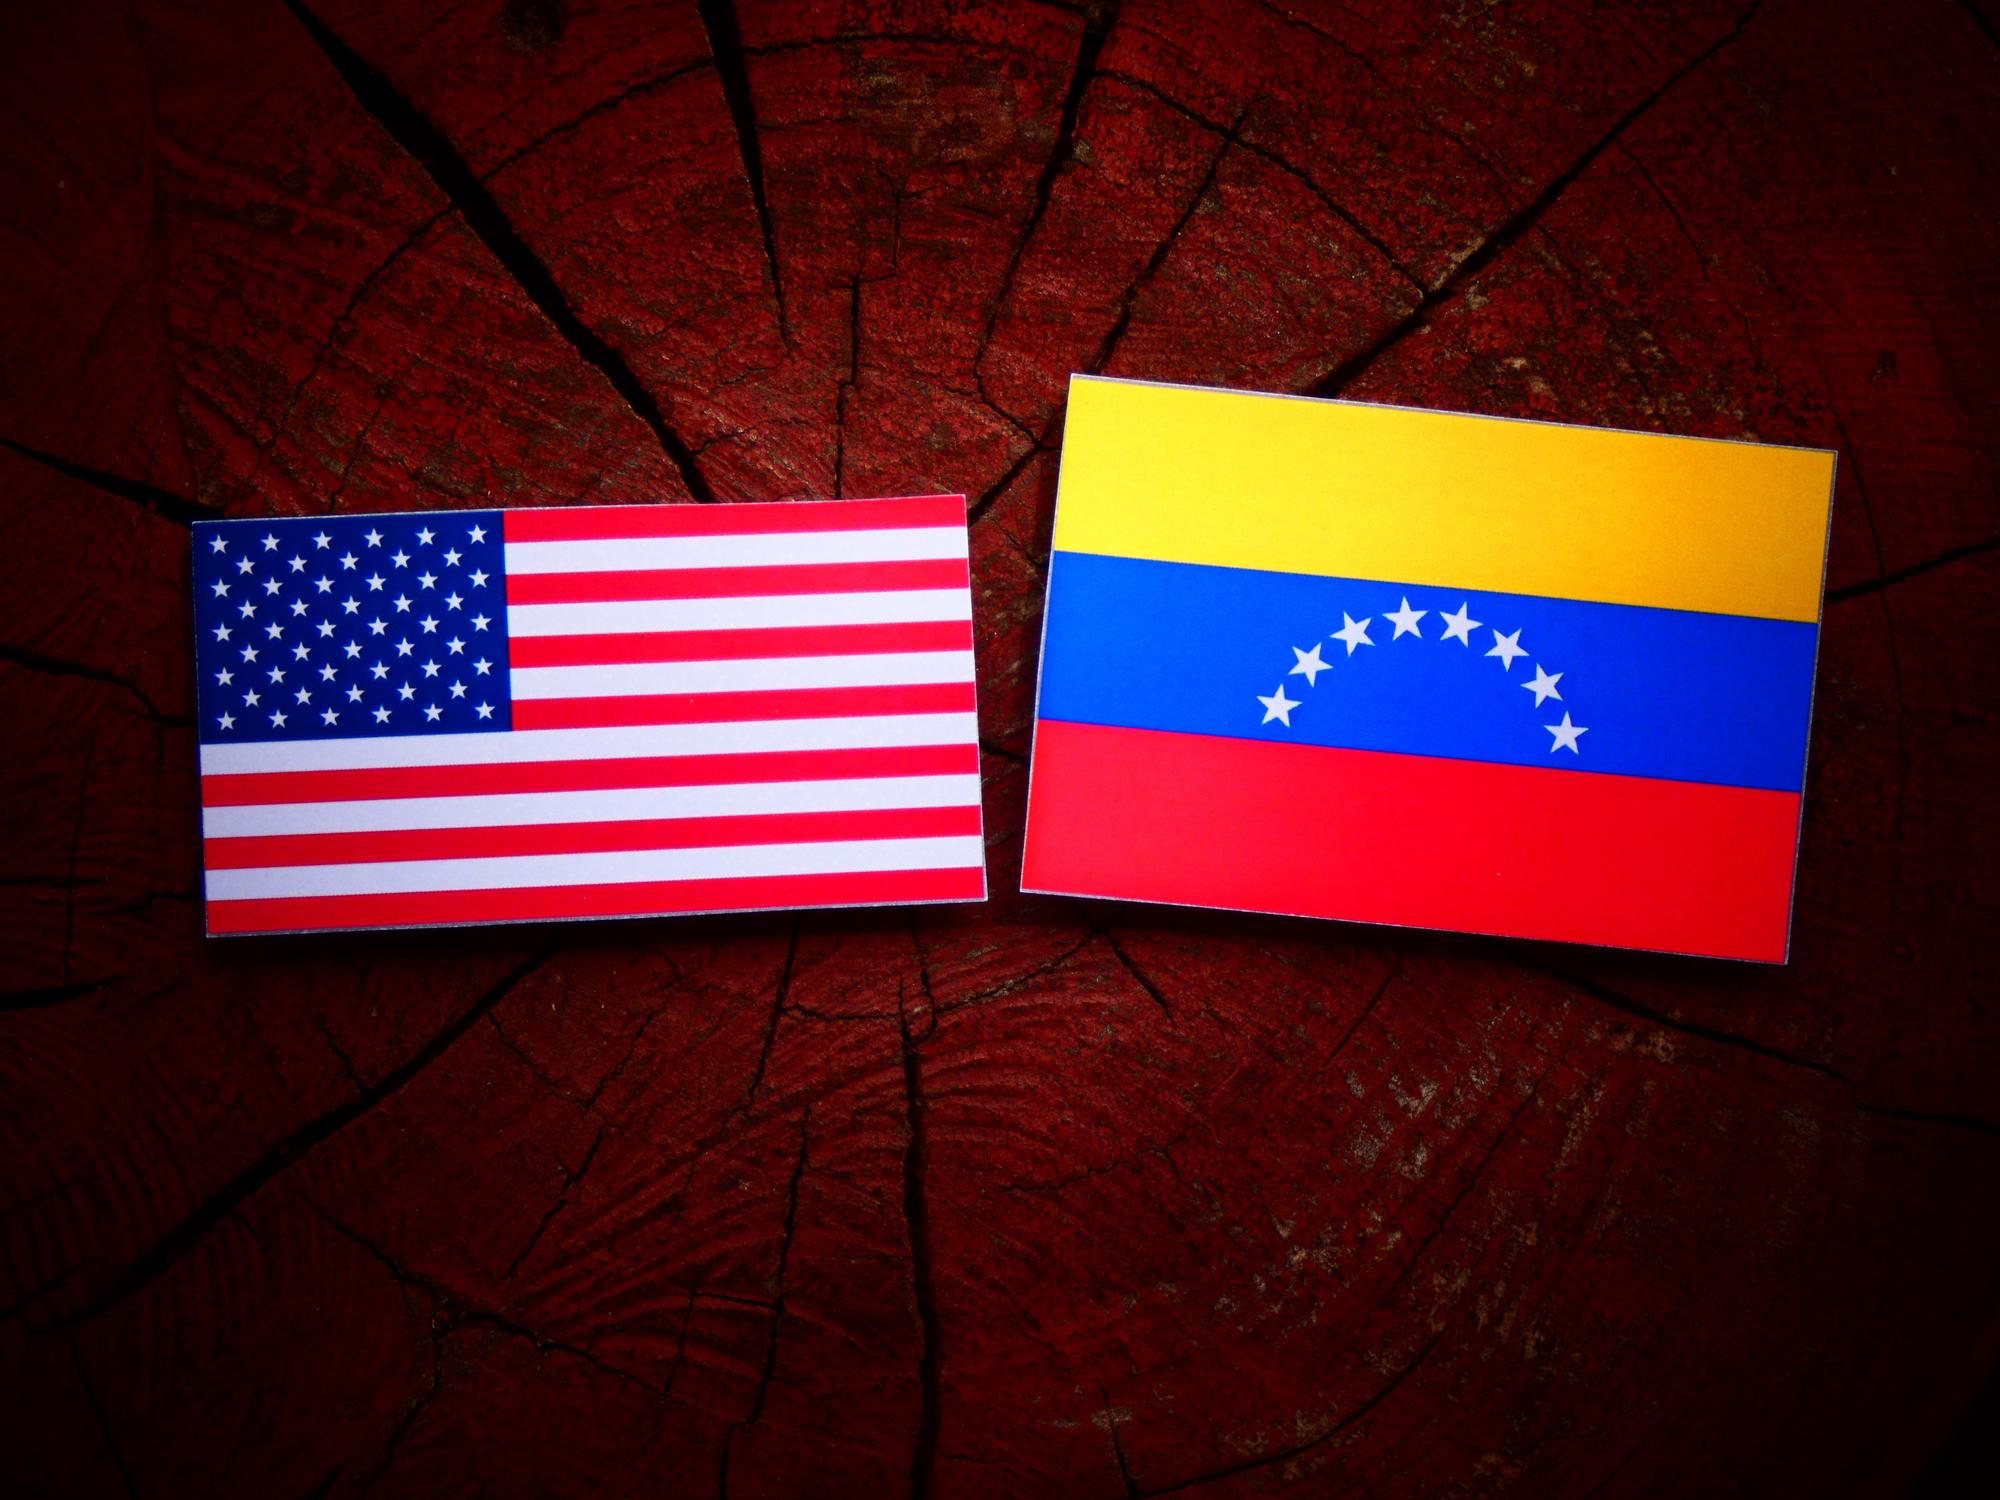 USA-flag-with-Venezuelan-flag-on-a-tree-stump-isolated-823303598_2003x1502.jpeg